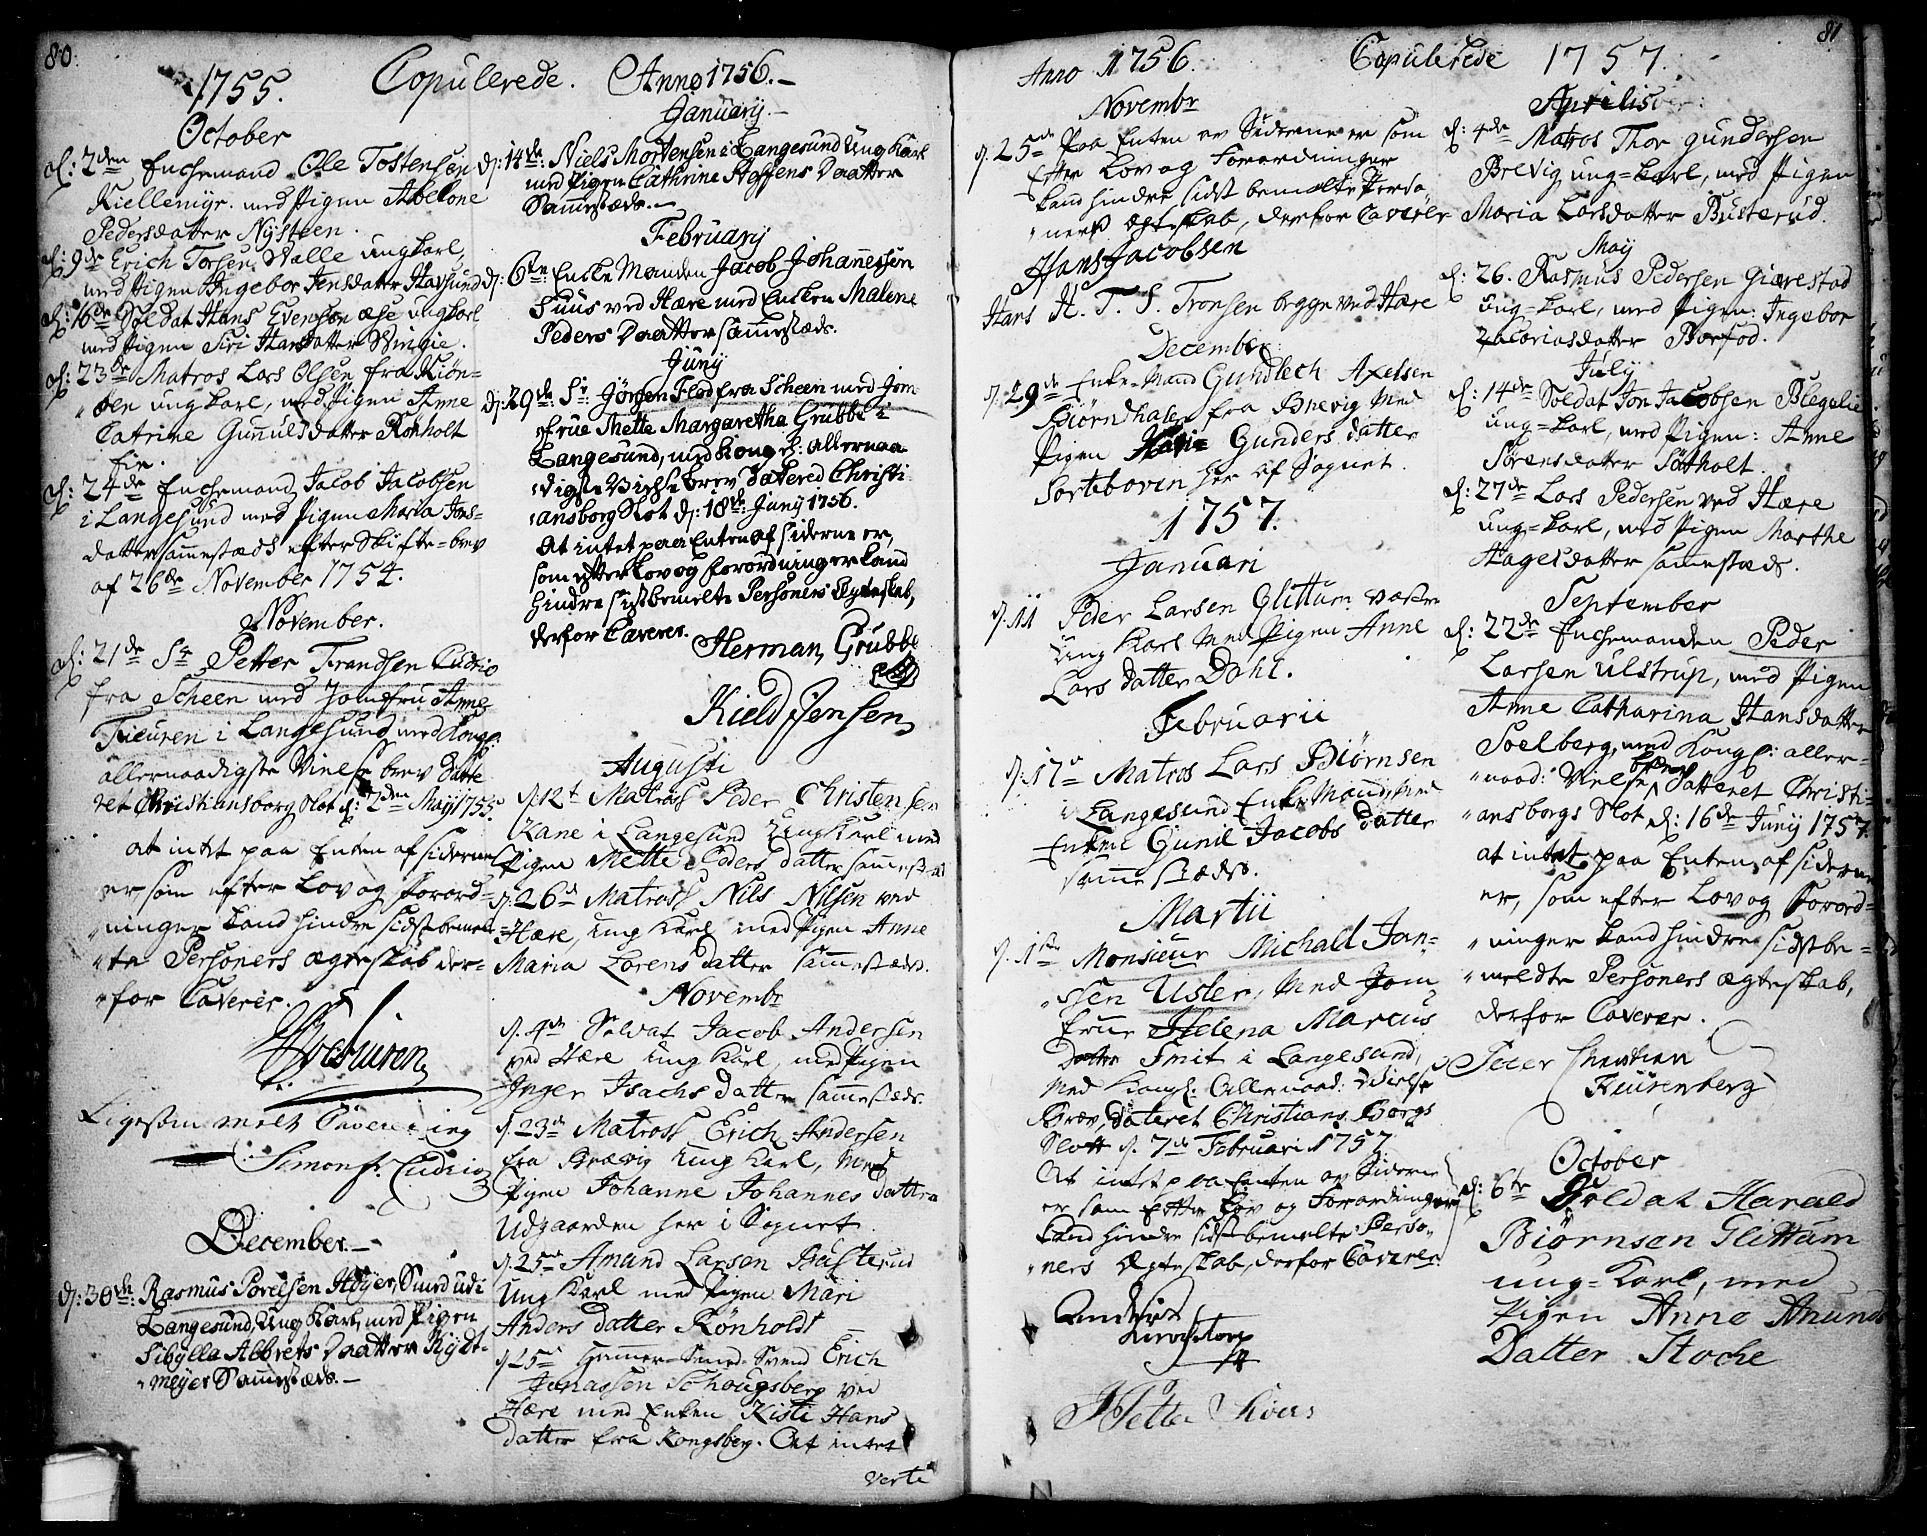 SAKO, Bamble kirkebøker, F/Fa/L0001: Ministerialbok nr. I 1, 1702-1774, s. 80-81